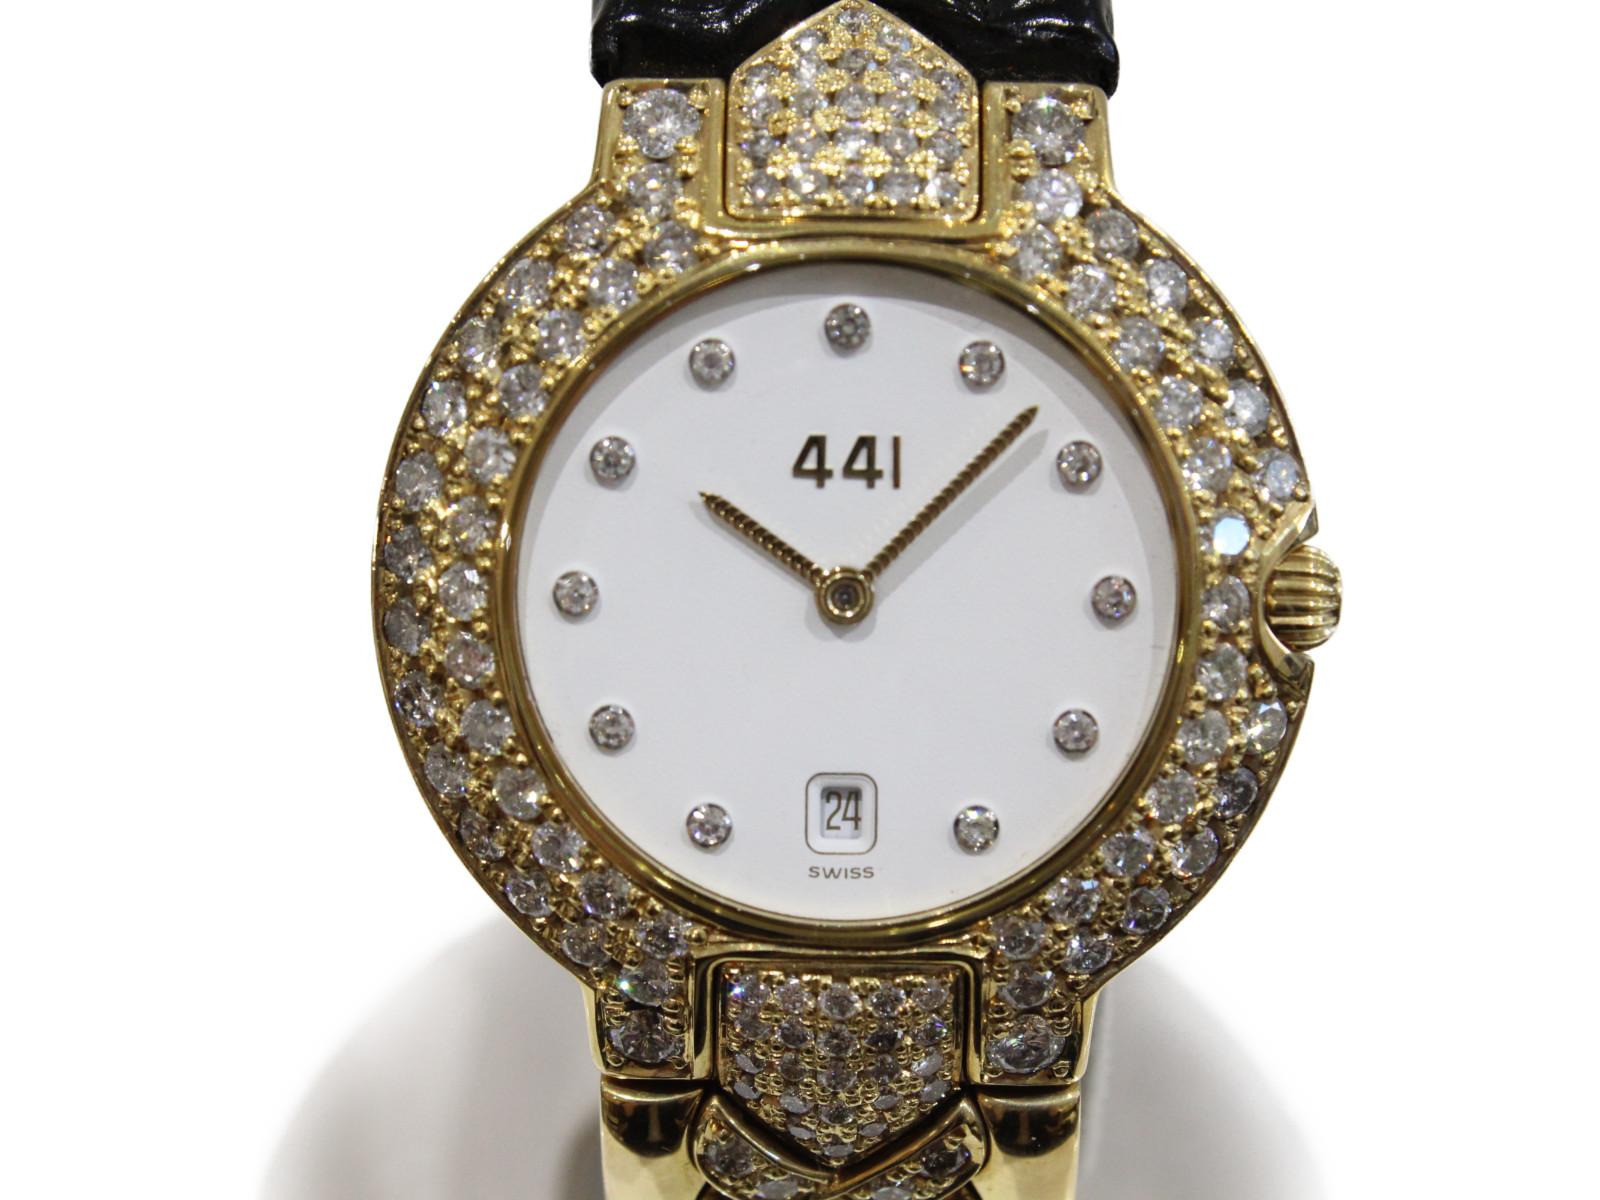 GianniVersace ジャンニ ヴェルサーチ クオーツ デイト 金無垢 K18 イエローゴールド ダイヤモンド164P 革ベルト メンズ 腕時計【中古】